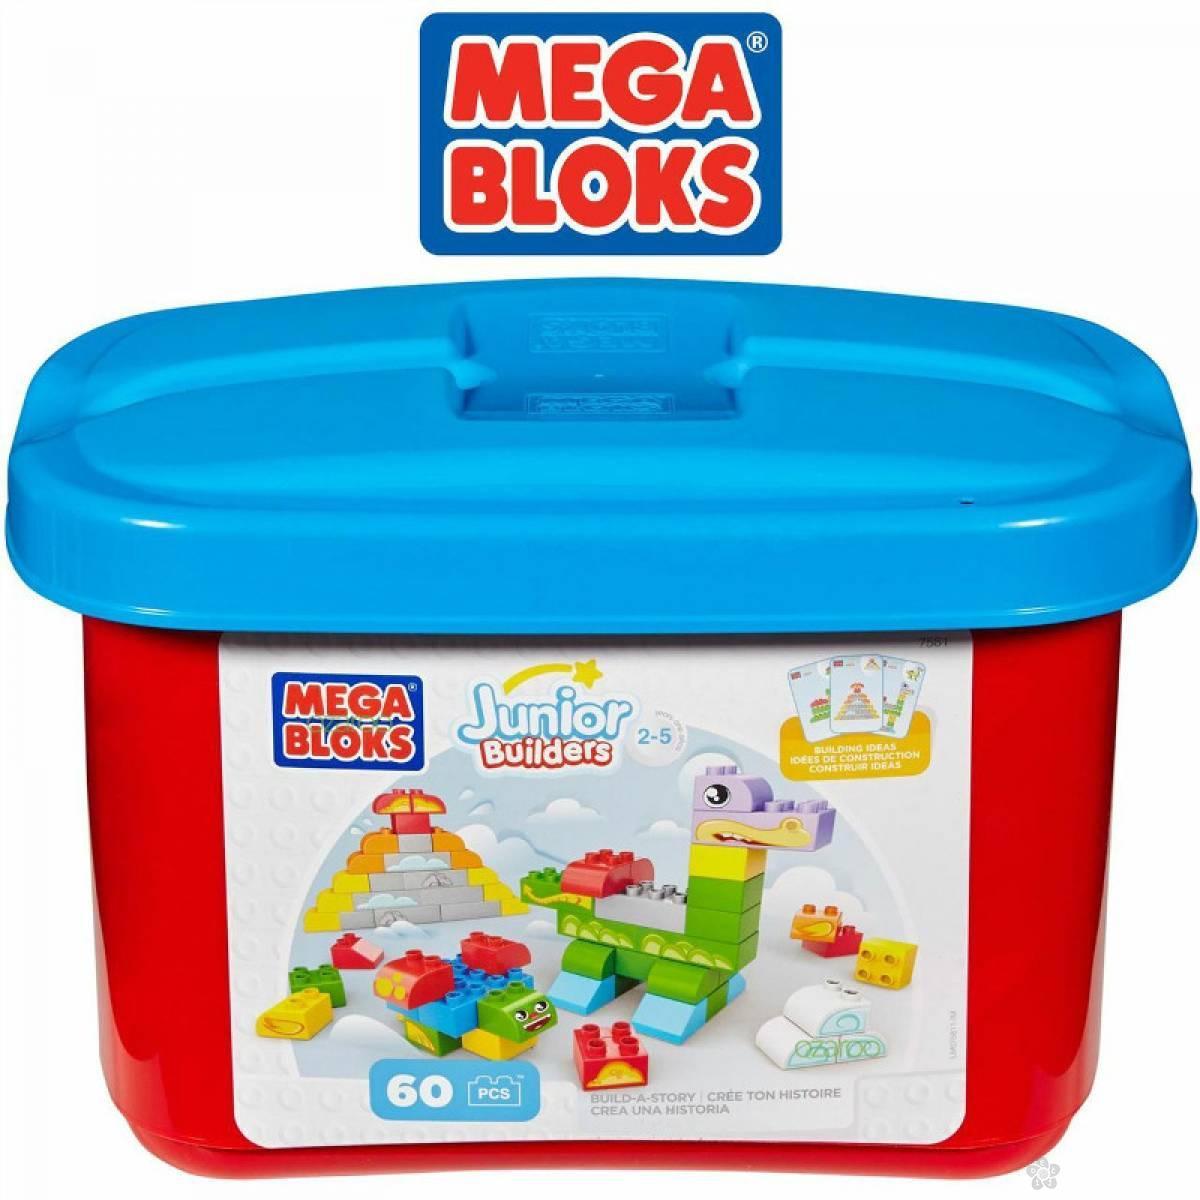 Kuca Sveznalica MAFPP00 + gratis Mega Blocks CYR22